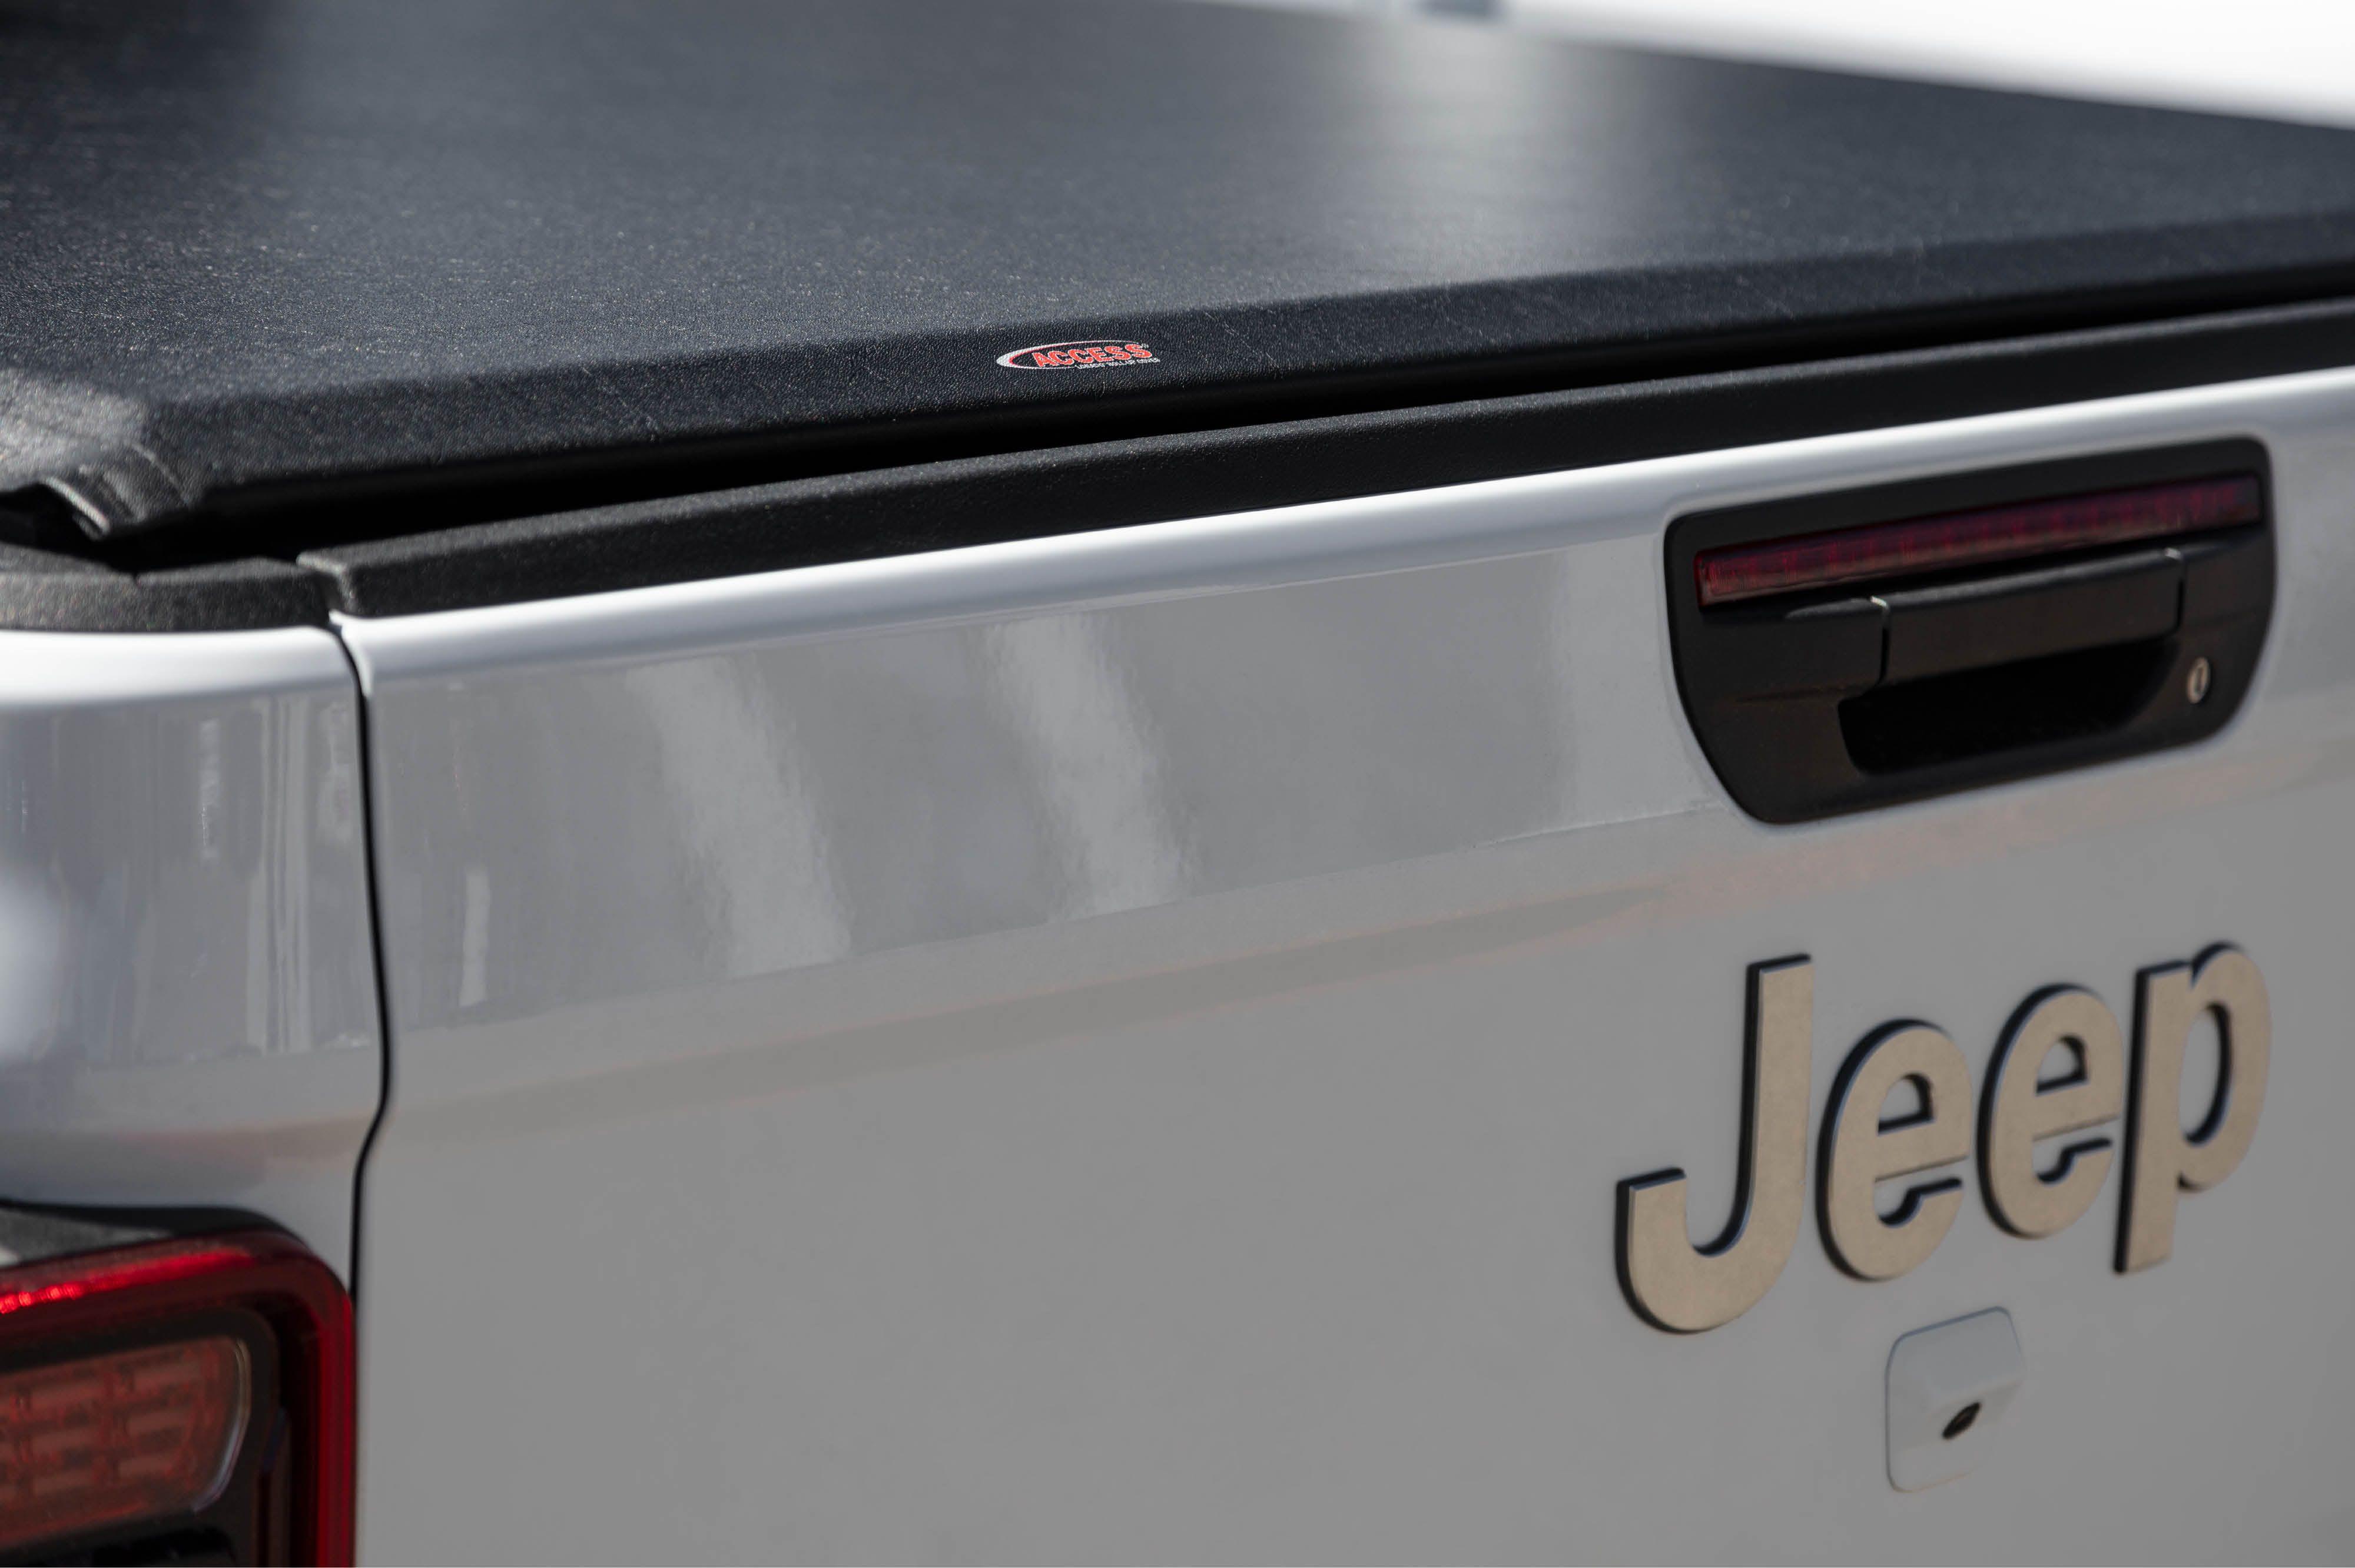 Turn heads upon arrival. ComingSoon Jeep Gladiator